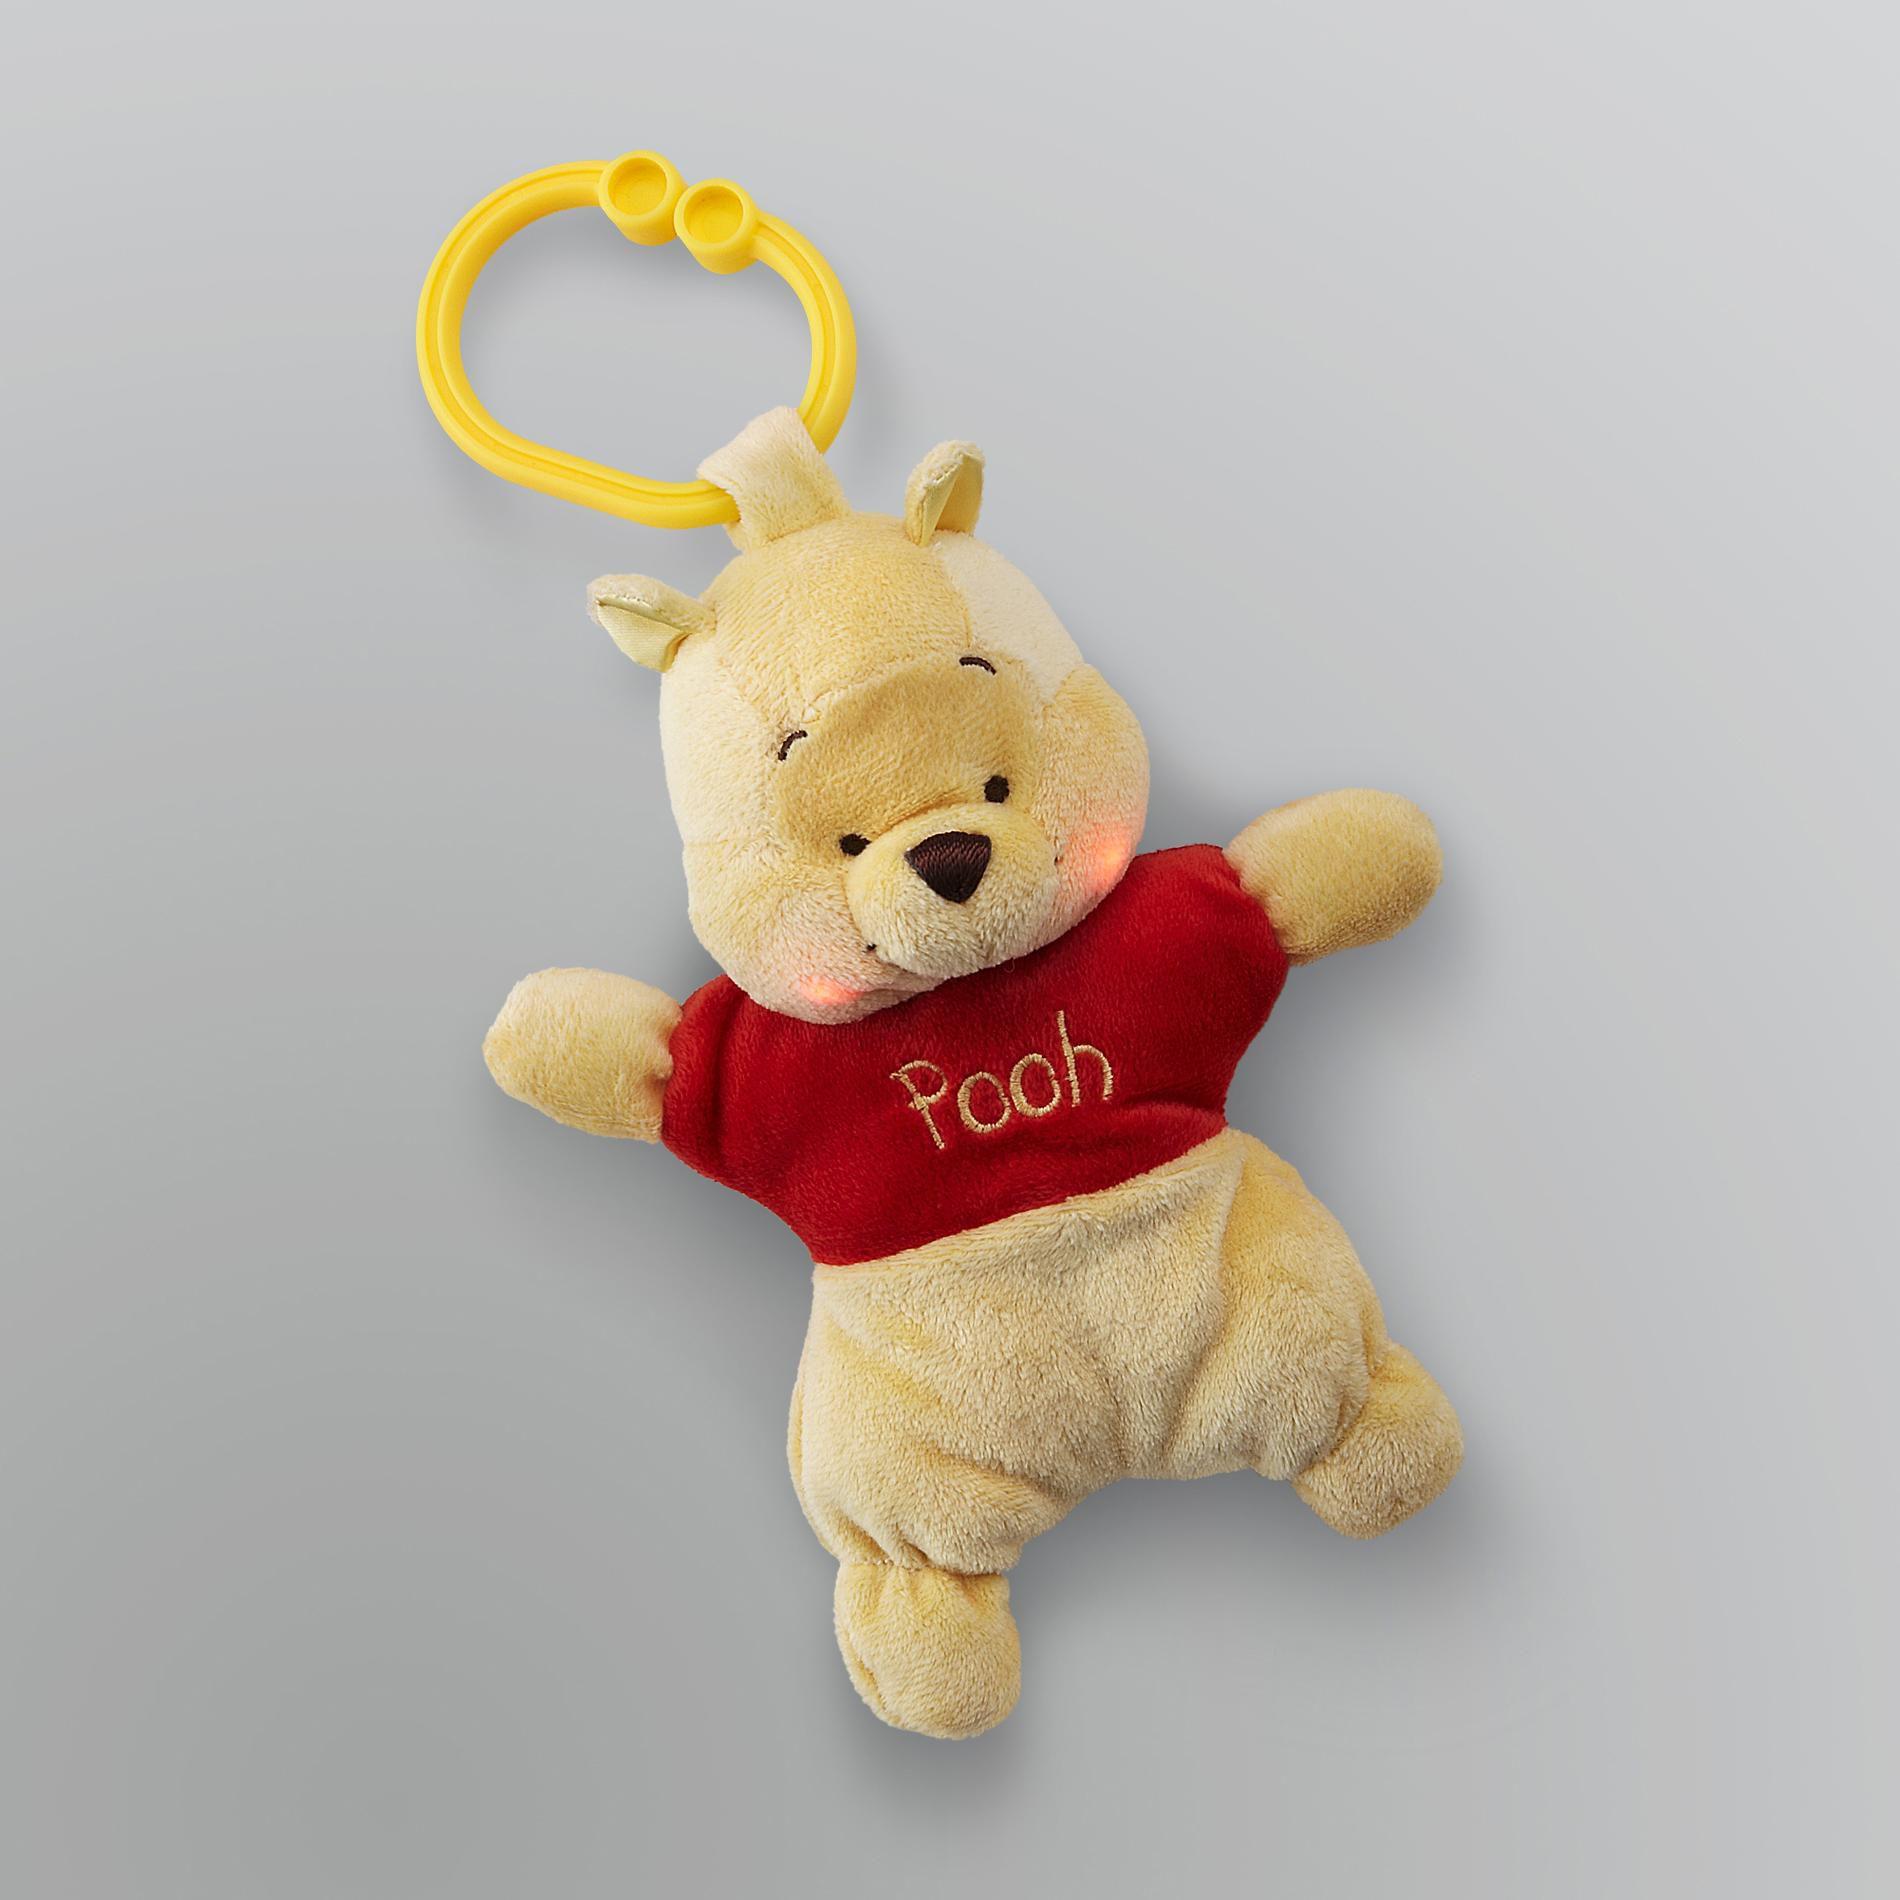 Disney Attachable Plush Toy Winnie The Pooh Pooh